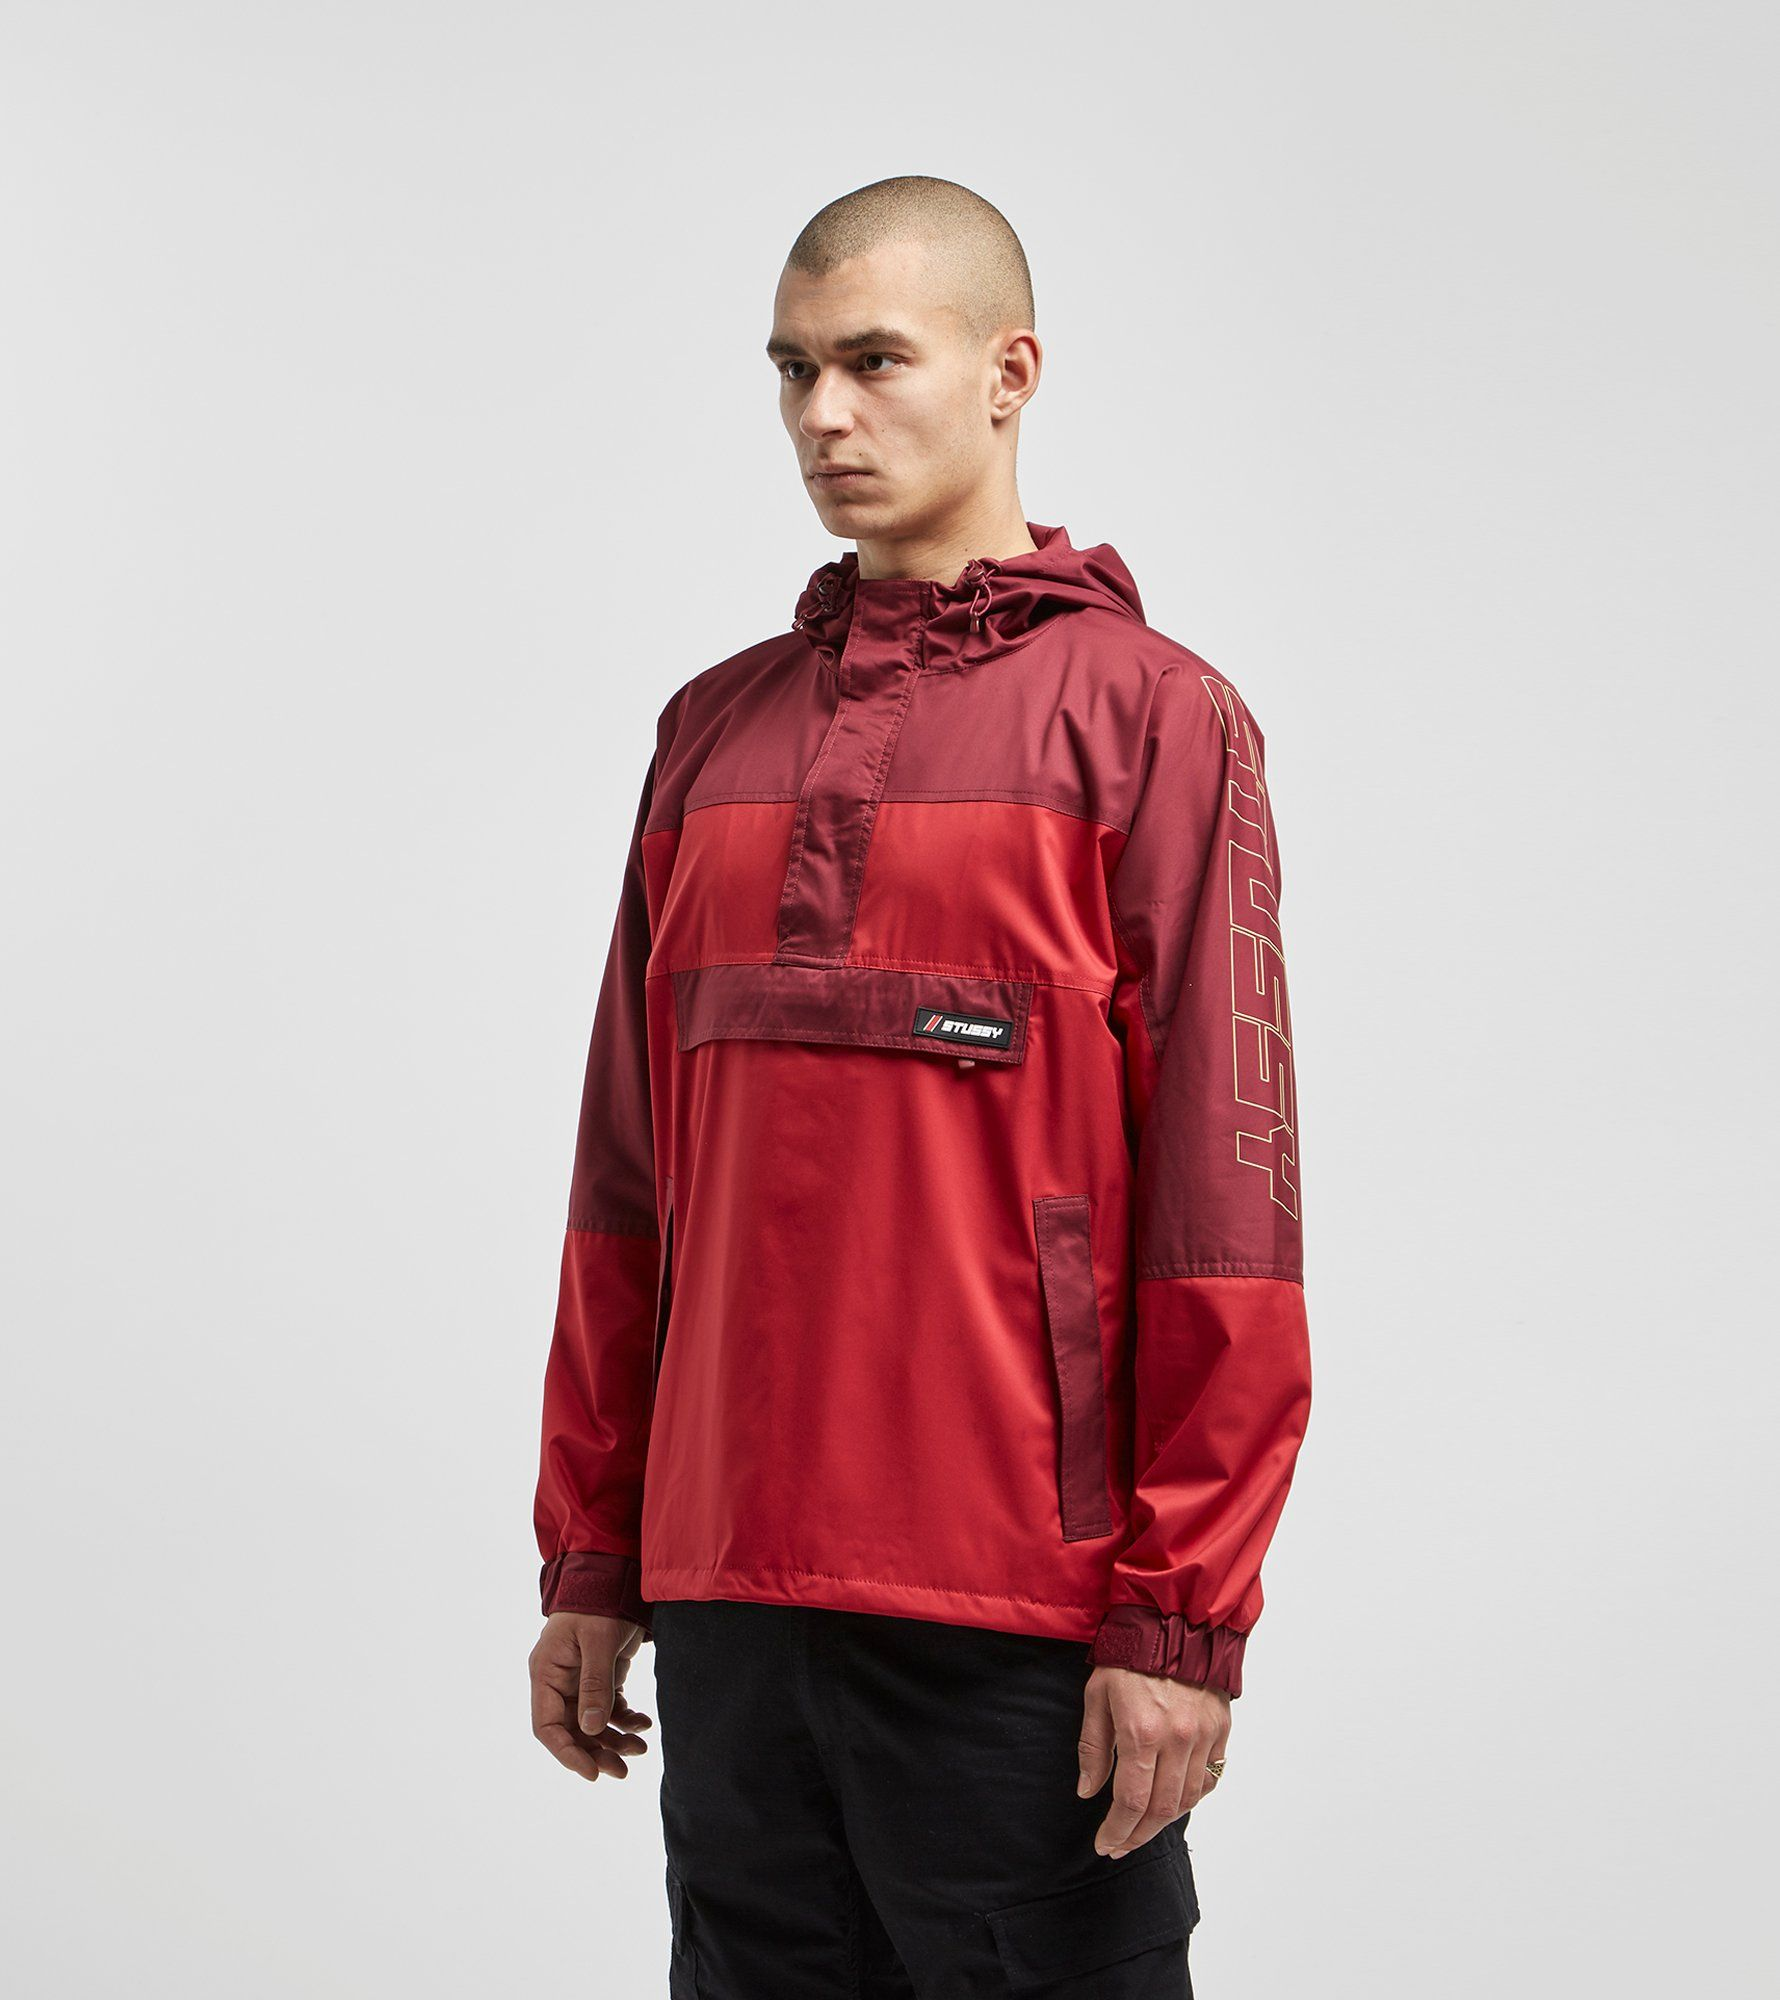 Stussy Allpine Pullover Jacket